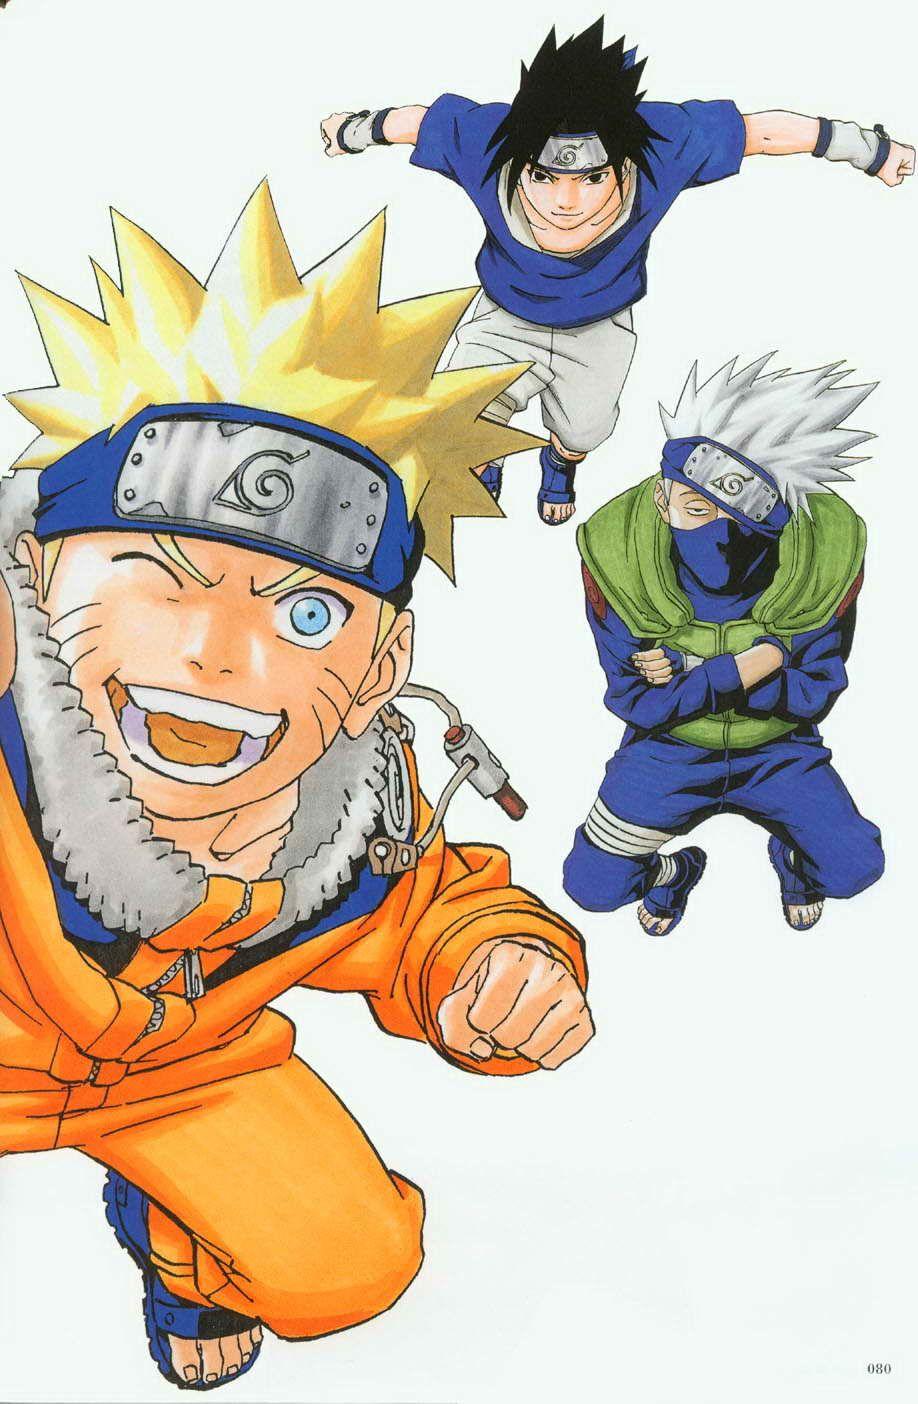 Naruto shippuden scan couleur recherche google - Coloriage naruto shippuden en couleur ...